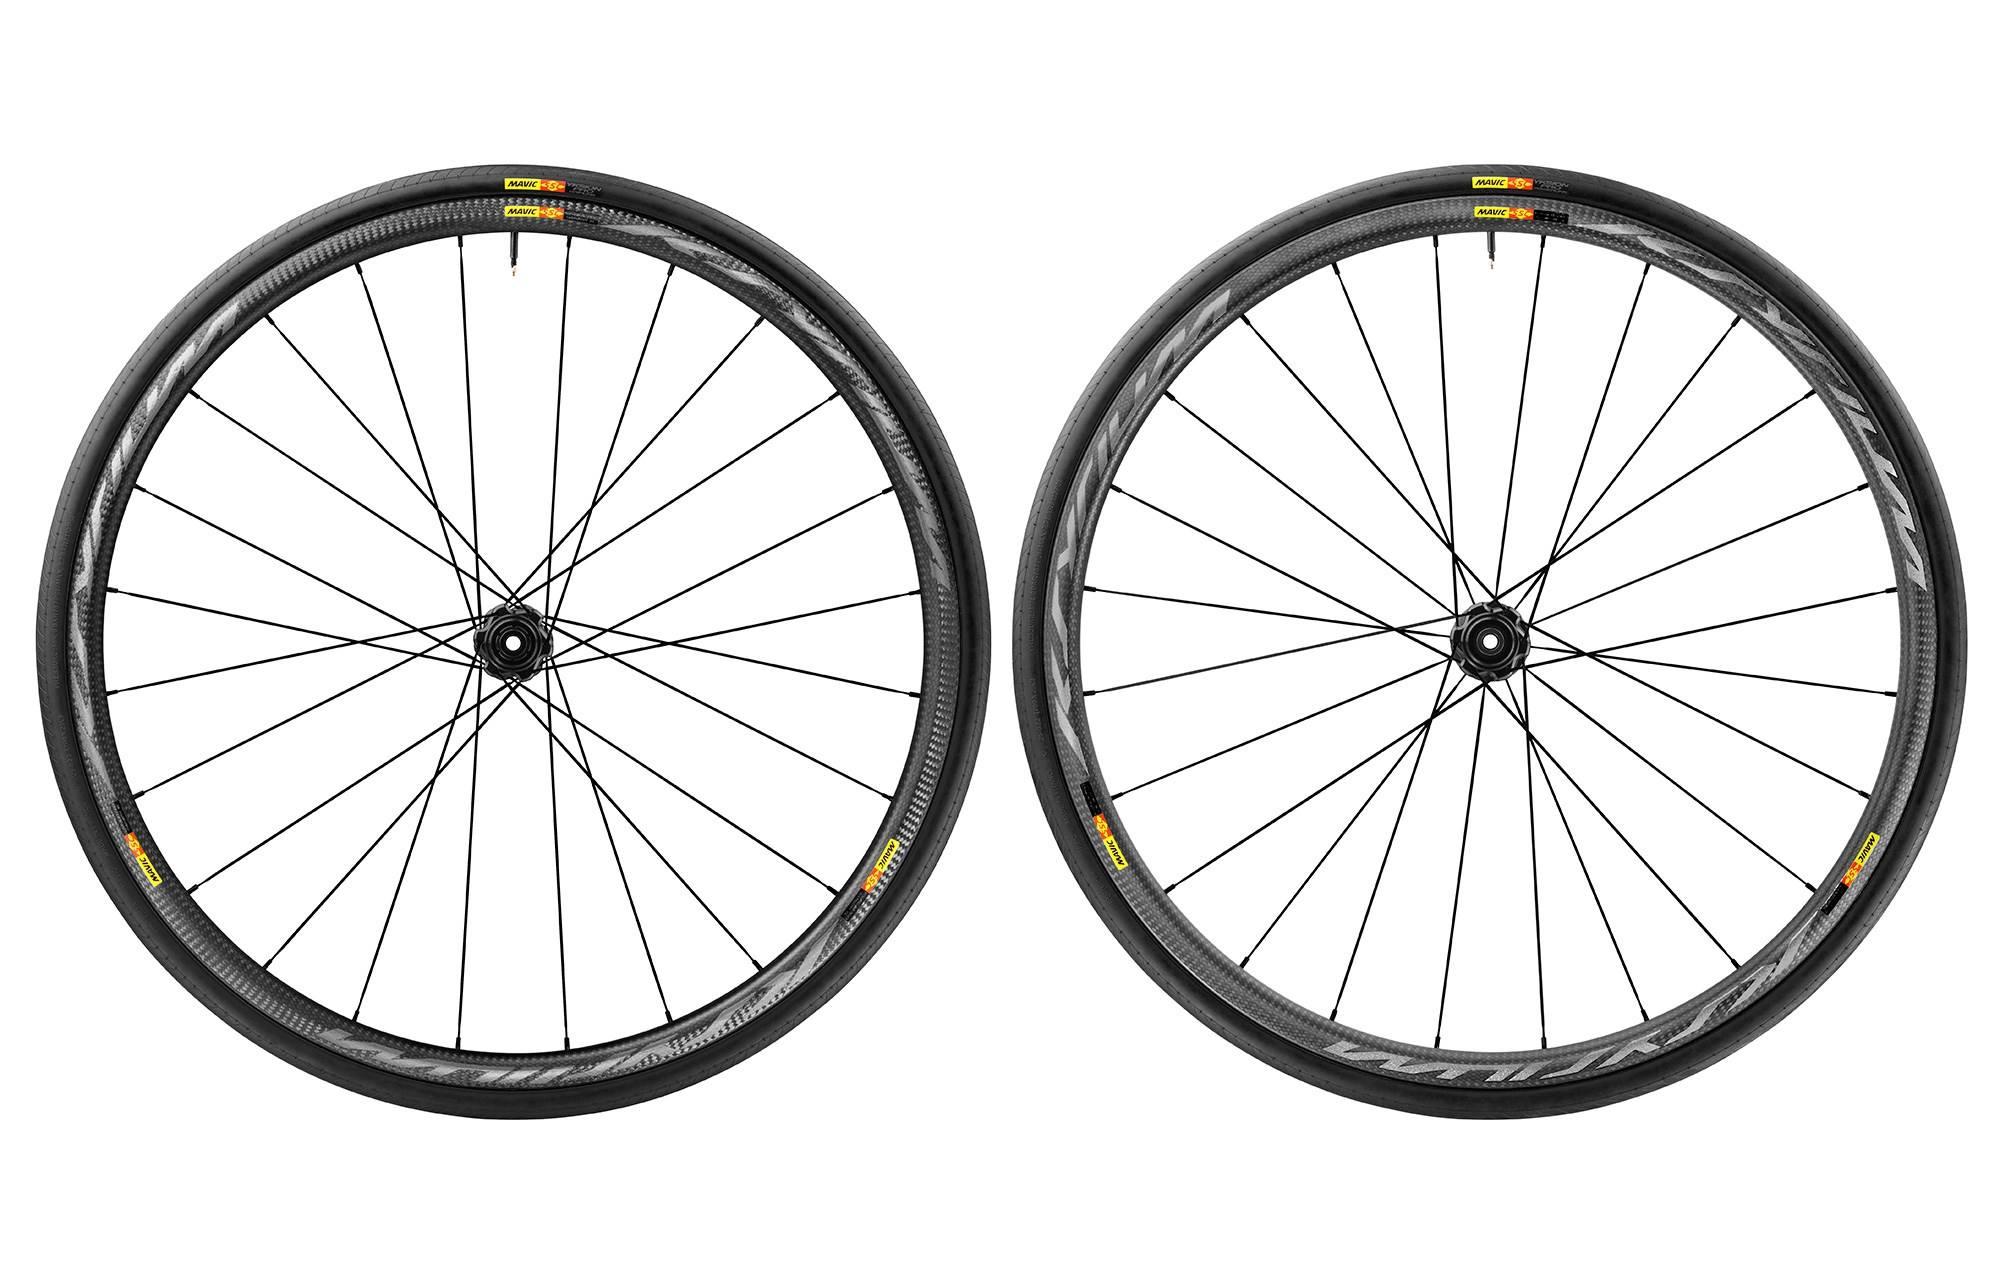 b7bf48204fd Mavic Ksyrium Pro Carbon SL Disc Clincher Wheelset | R&A Cycles